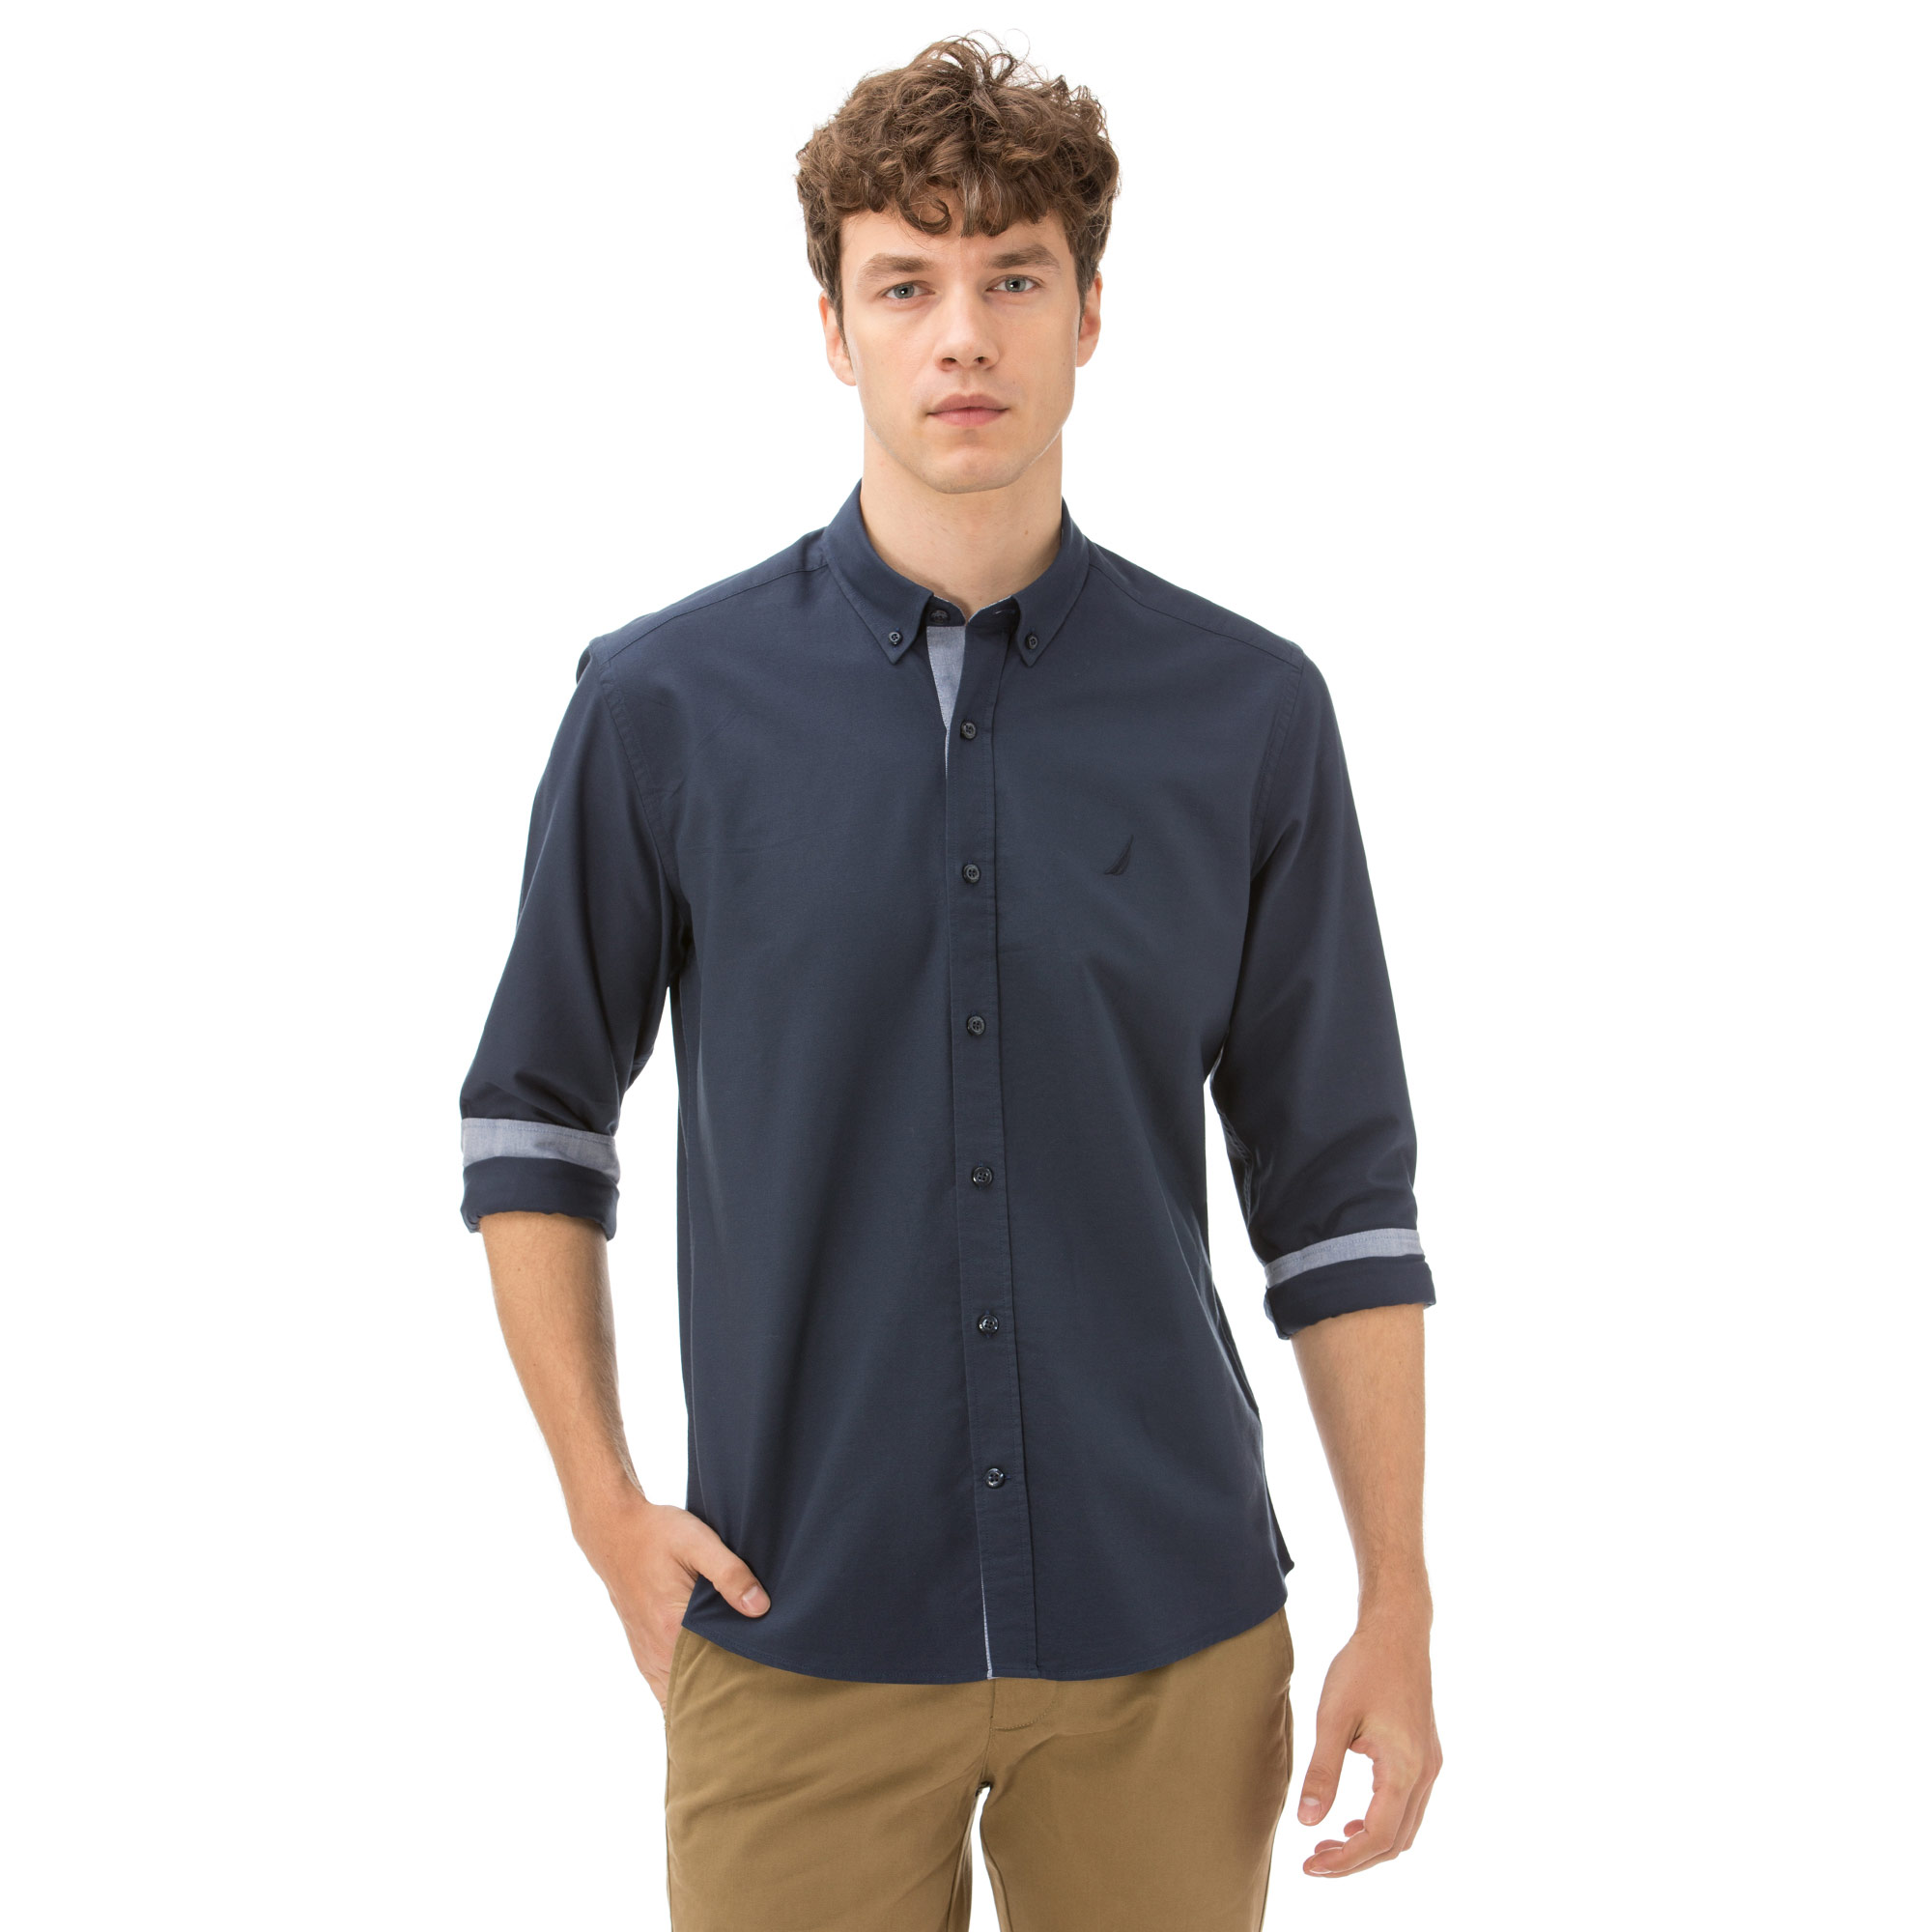 Nautica Erkek Slim Fit Palma Düğmeli Lacivert Gömlek